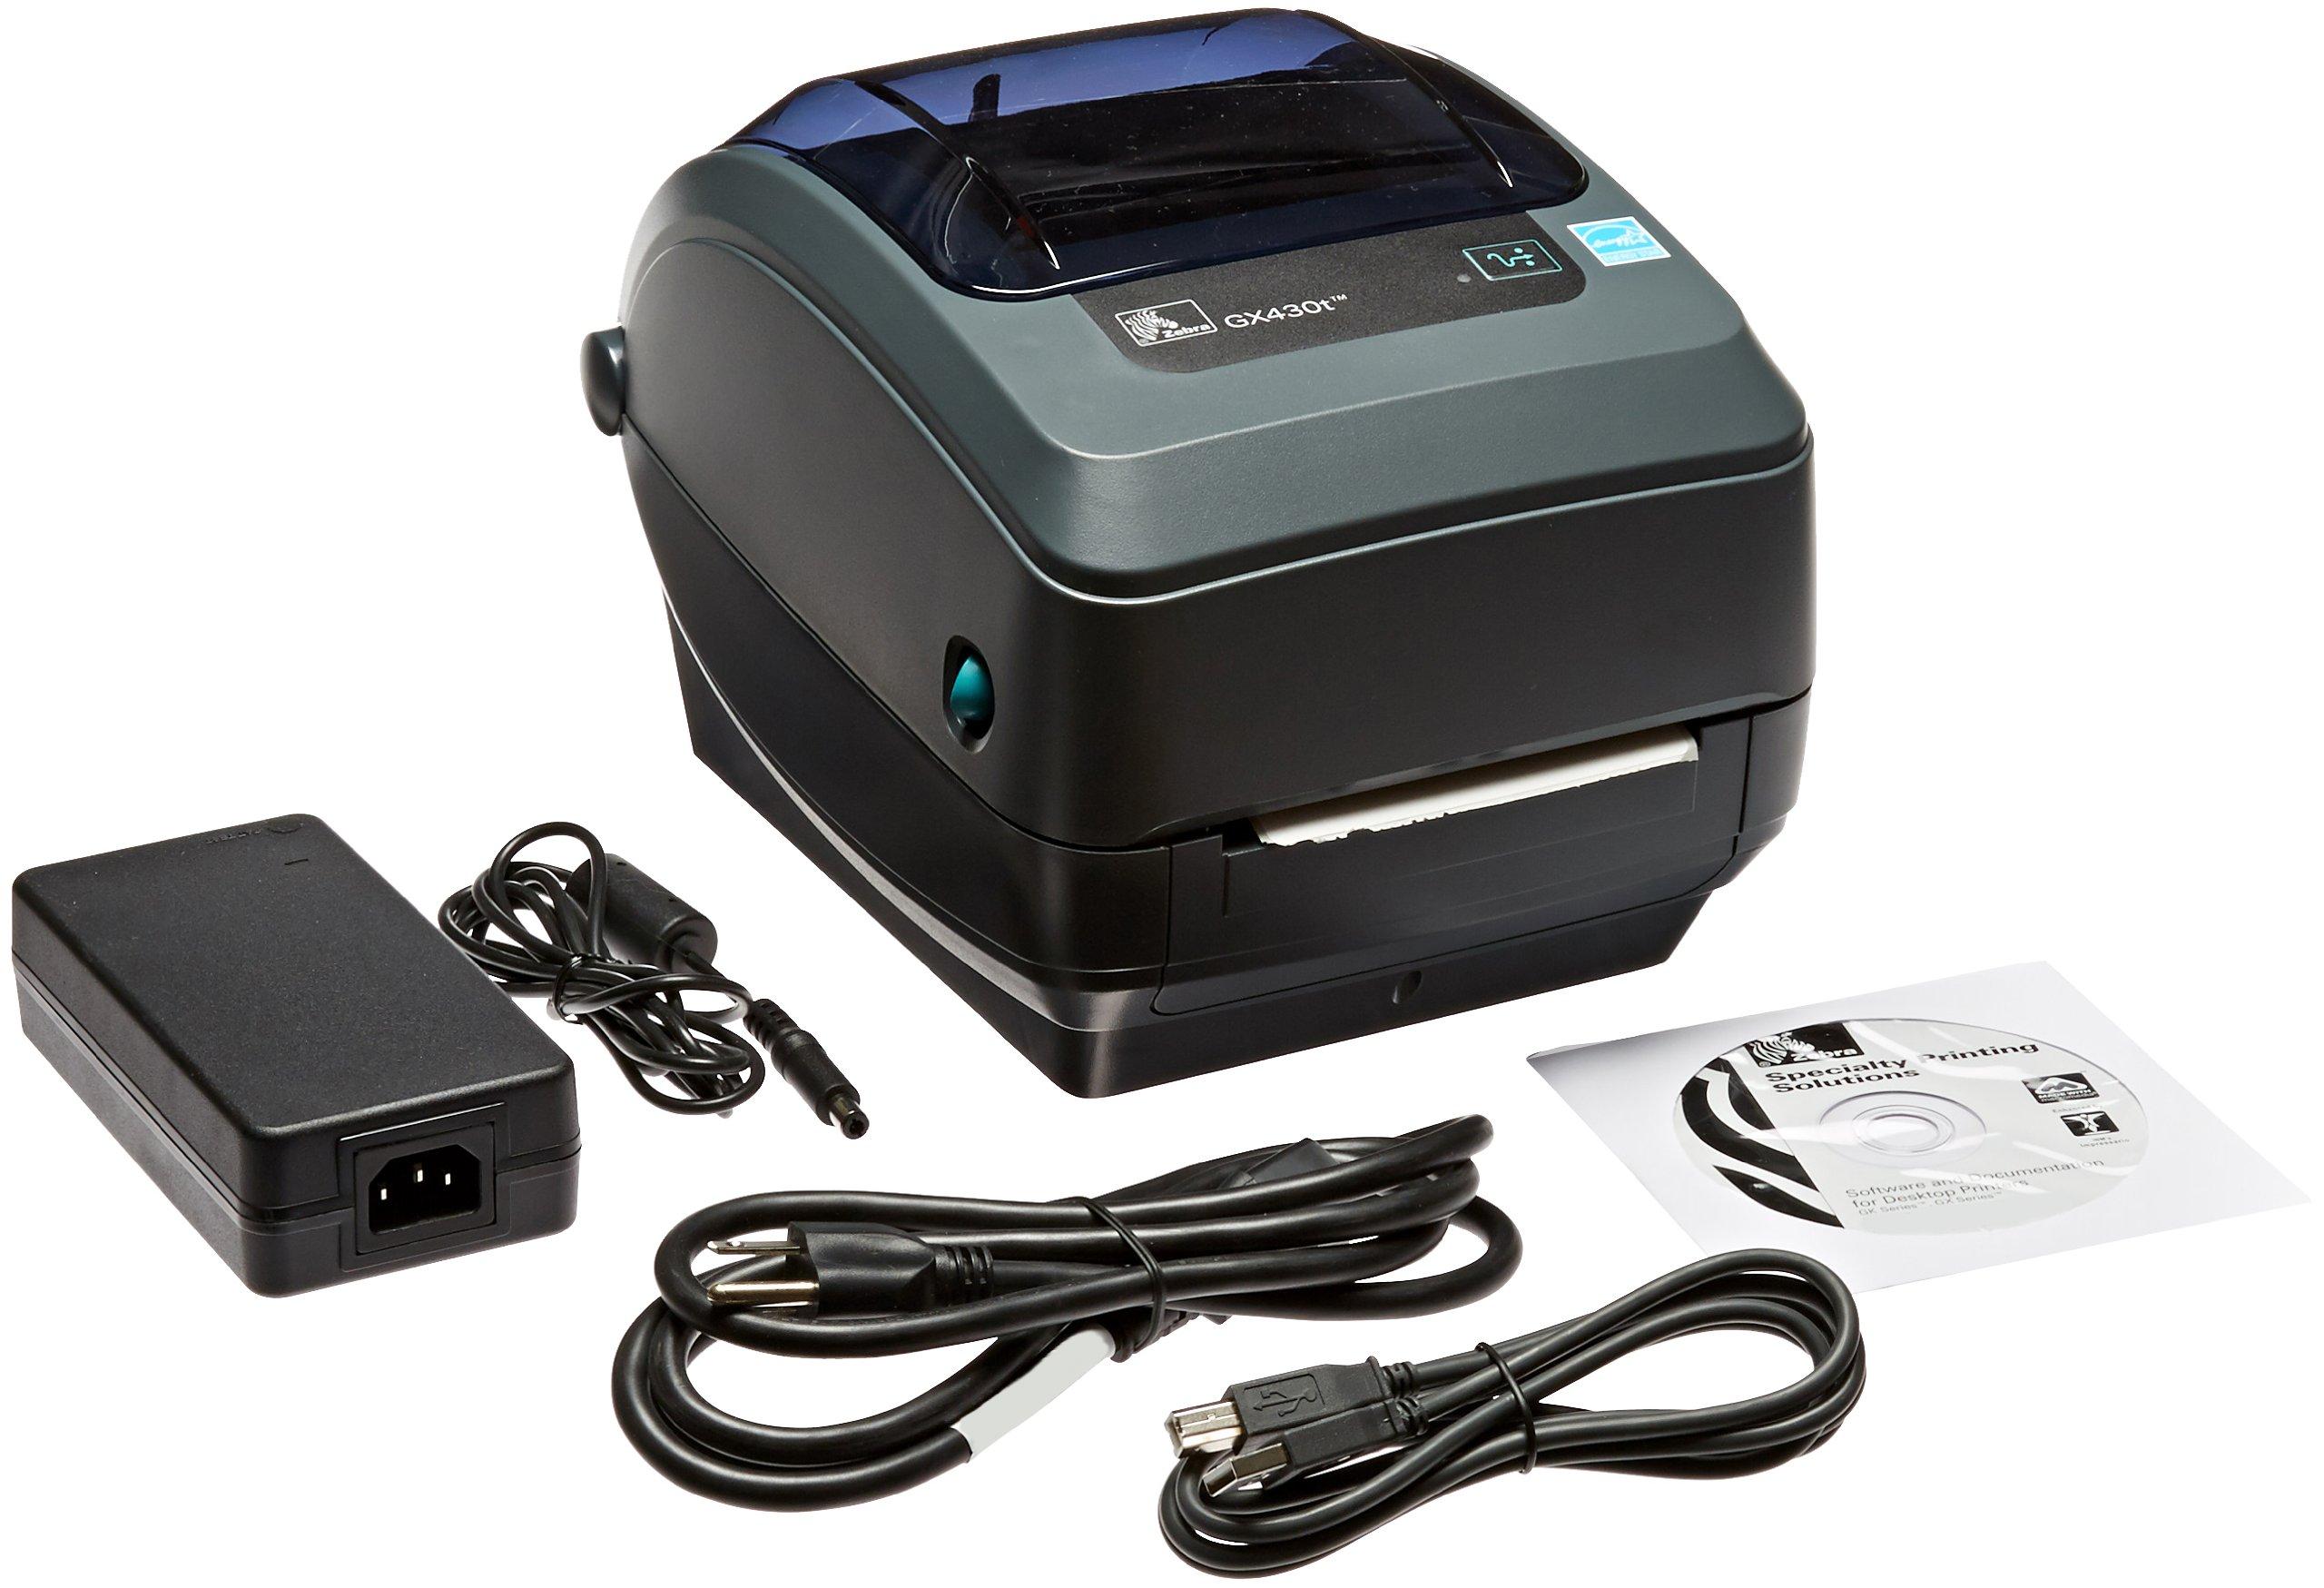 Zebra GX430t Monochrome Desktop Direct Thermal/Thermal Transfer Label Printer with Reflective and Transmissive Media Sensor, 4 in/s Print Speed, 300 dpi Print Resolution, 4.09'' Print Width, 100-240V AC